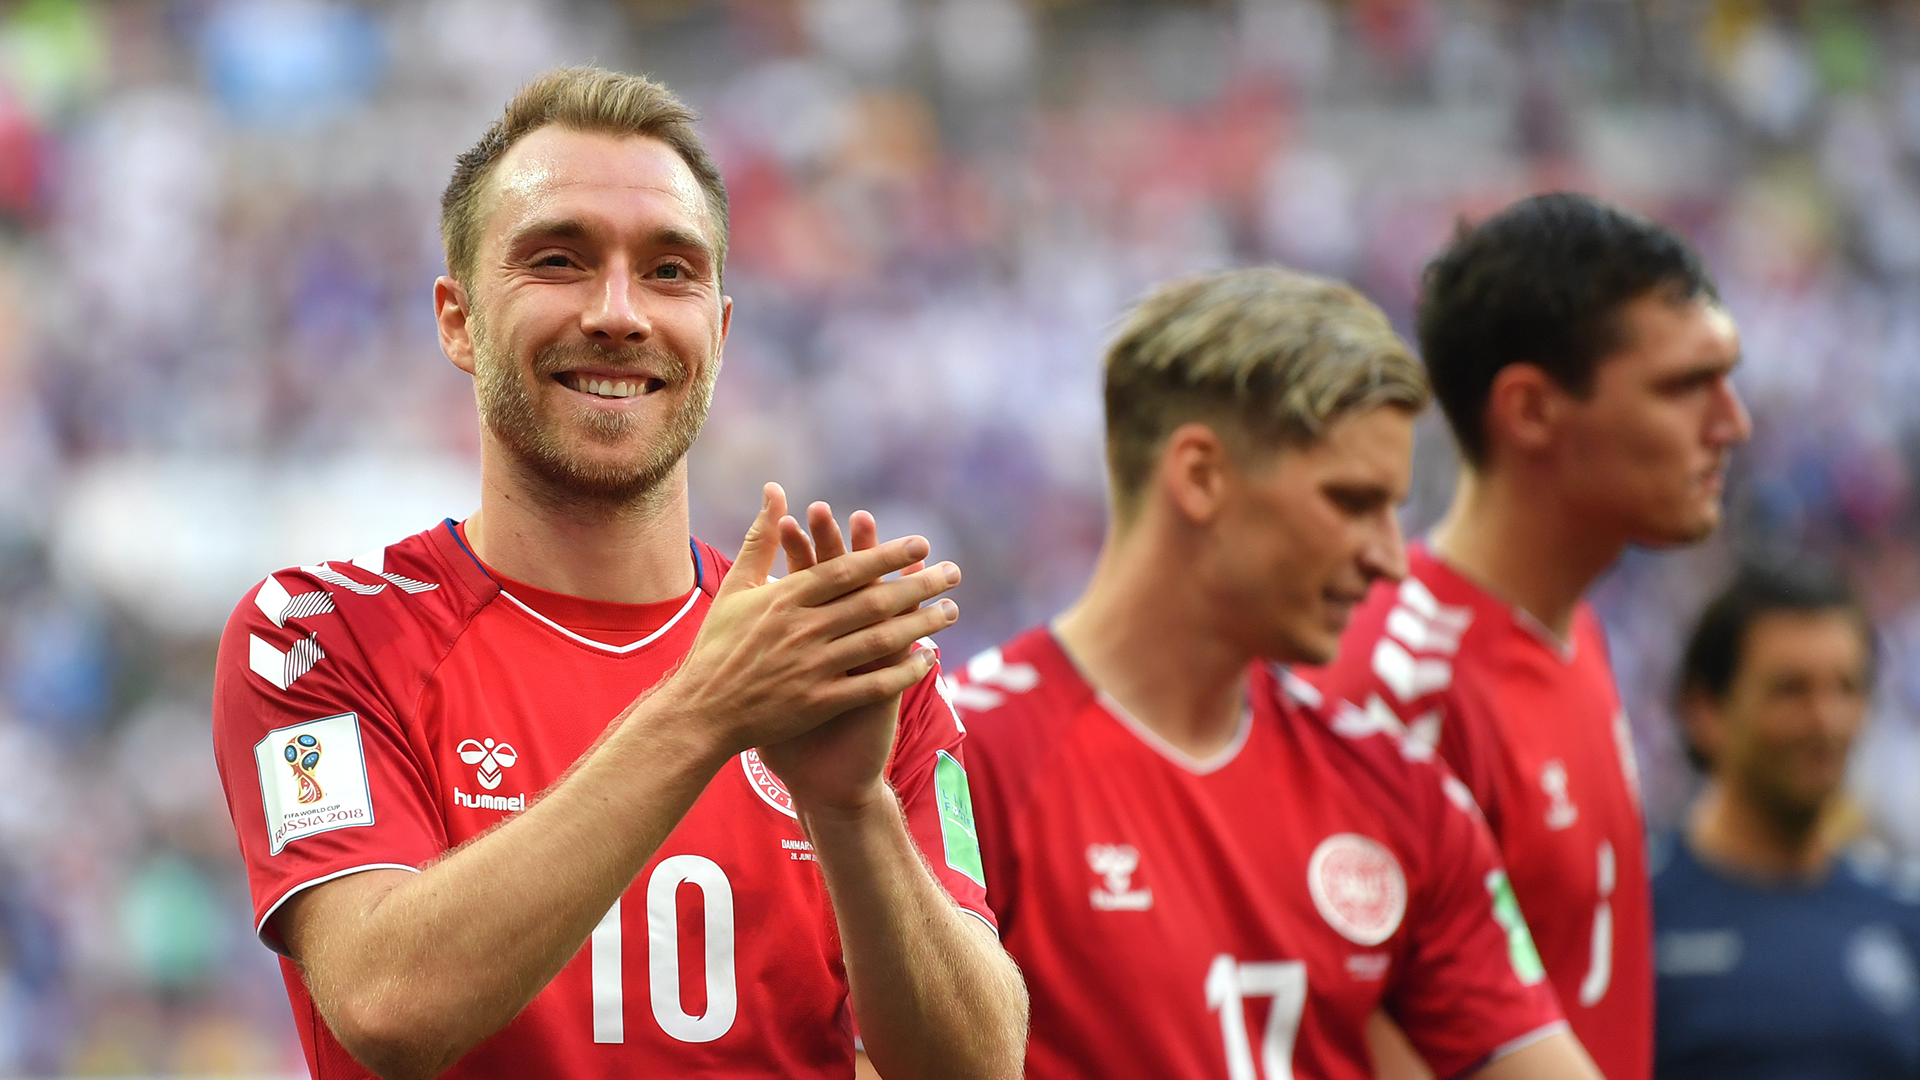 Christian Eriksen Denmark World Cup 2018